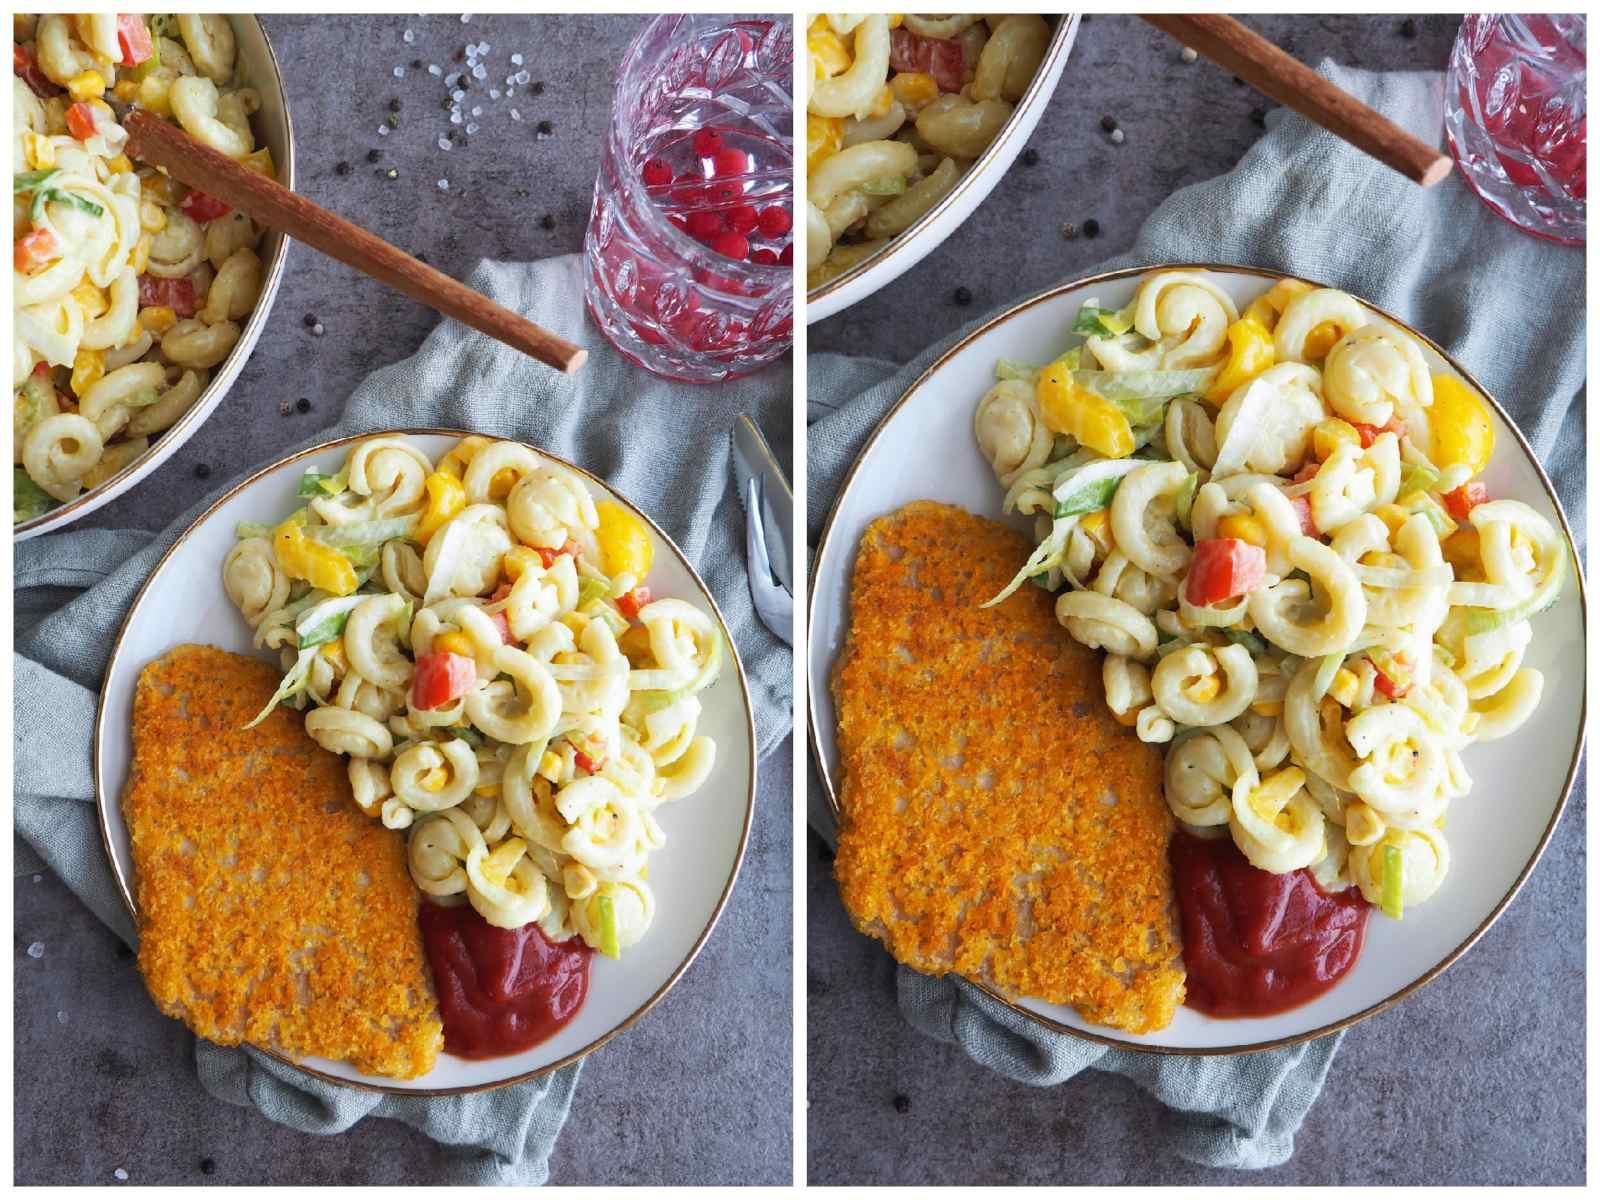 Veganer Trulli Nudelsalat mit veganem Schnitzel und Ketchup auf Teller